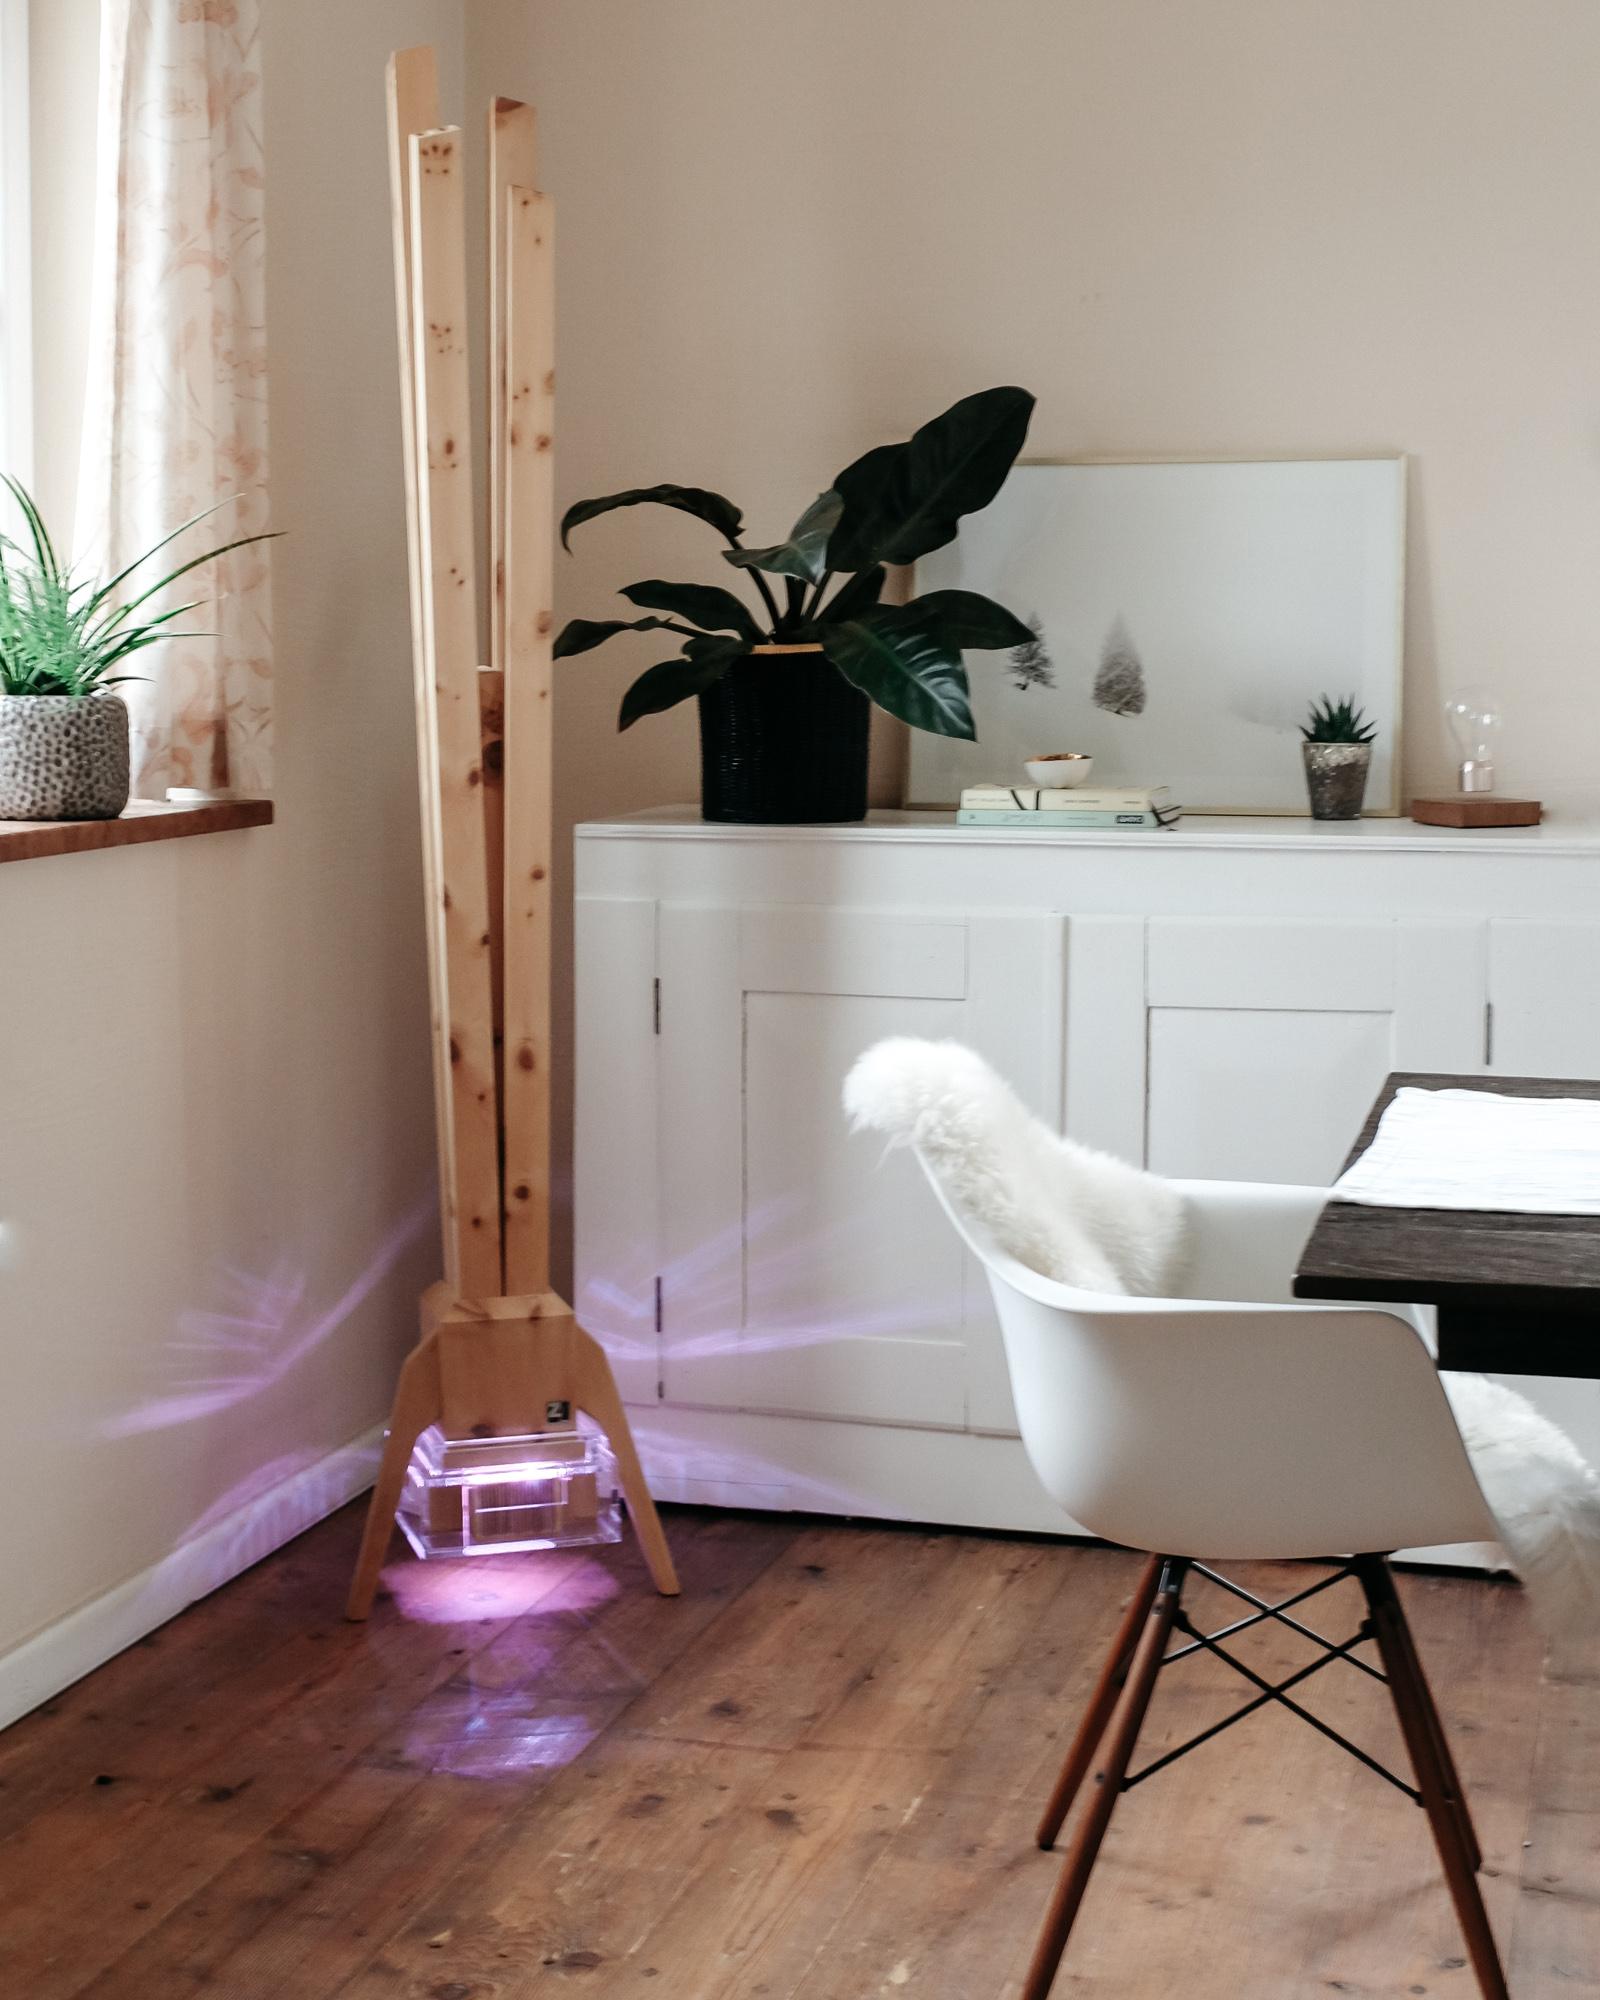 Inastil, Zirbenluefter, Interiordesign, Wooddesign, Raumklima, Zirbe,  Luxeryhome, Lifestyle,